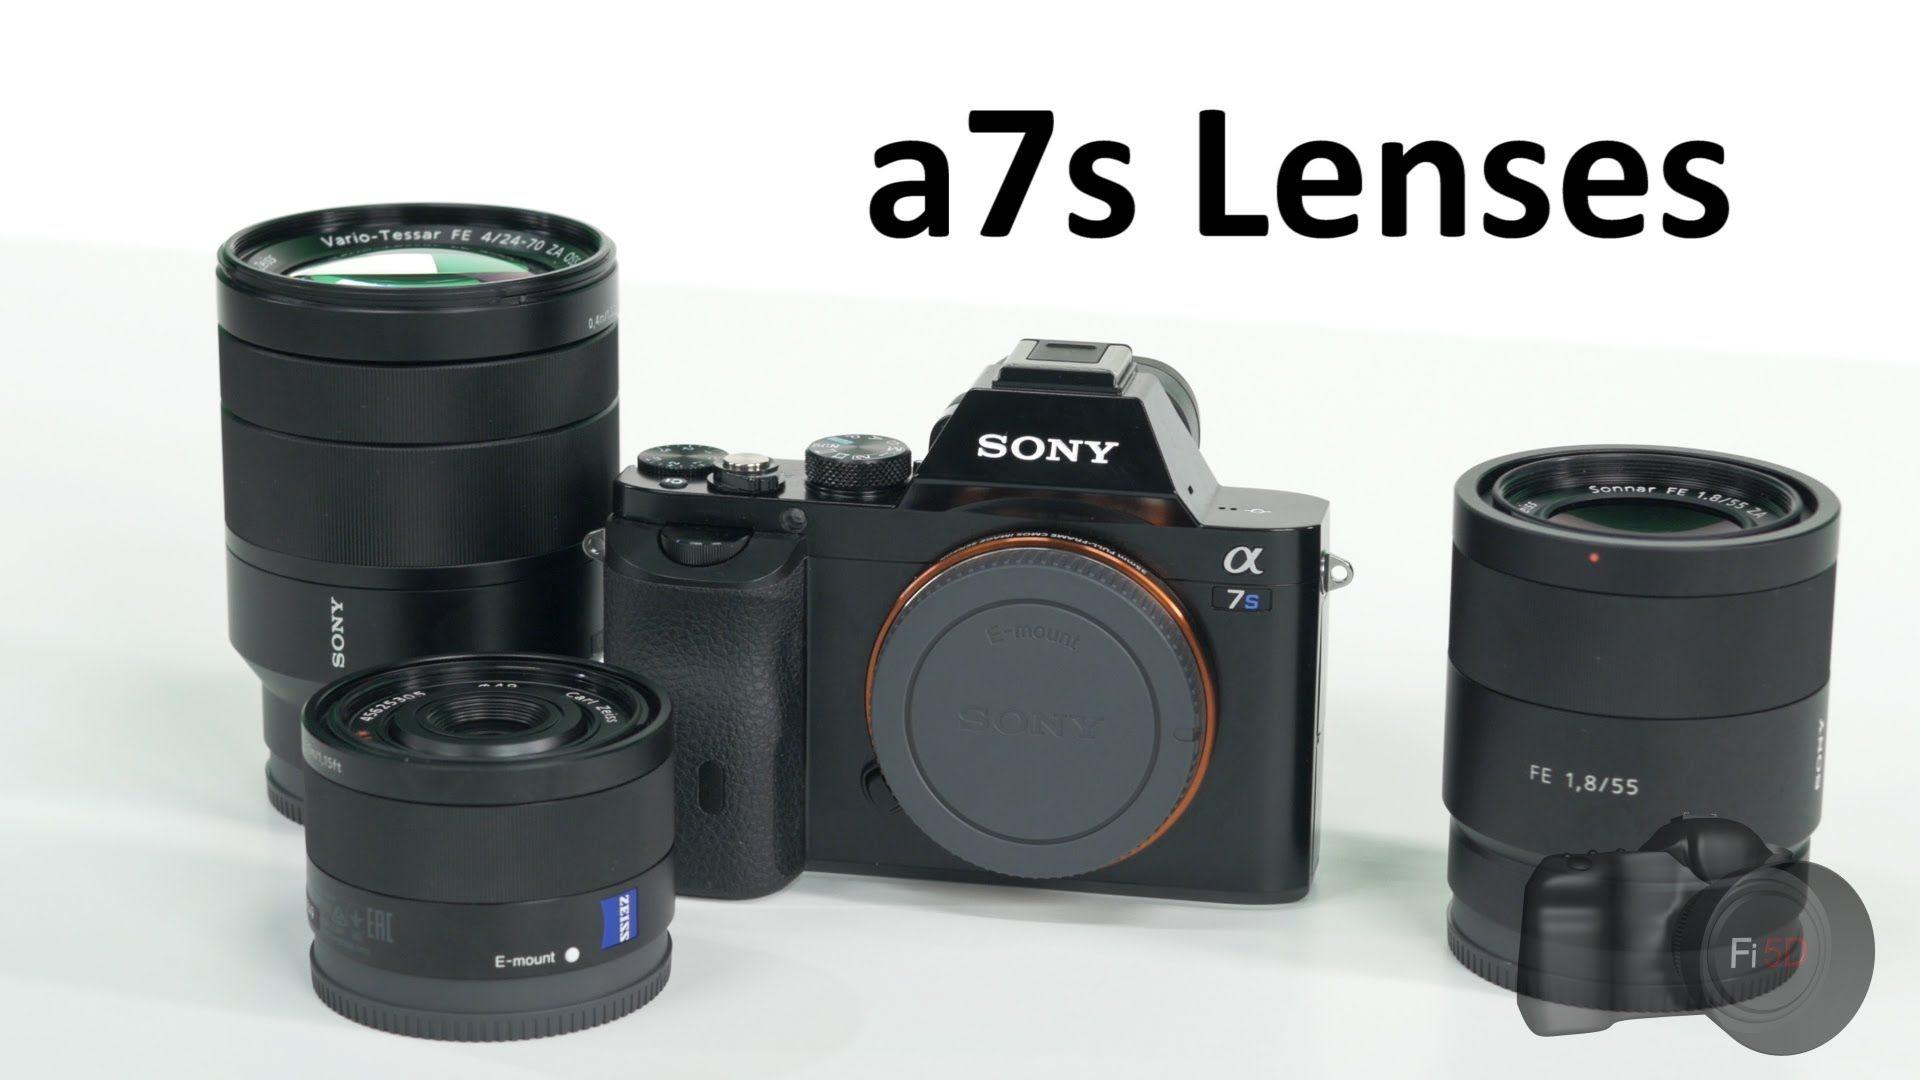 Sony A7s Lenses With Images Sony Sony Camera Sony Camera Alpha